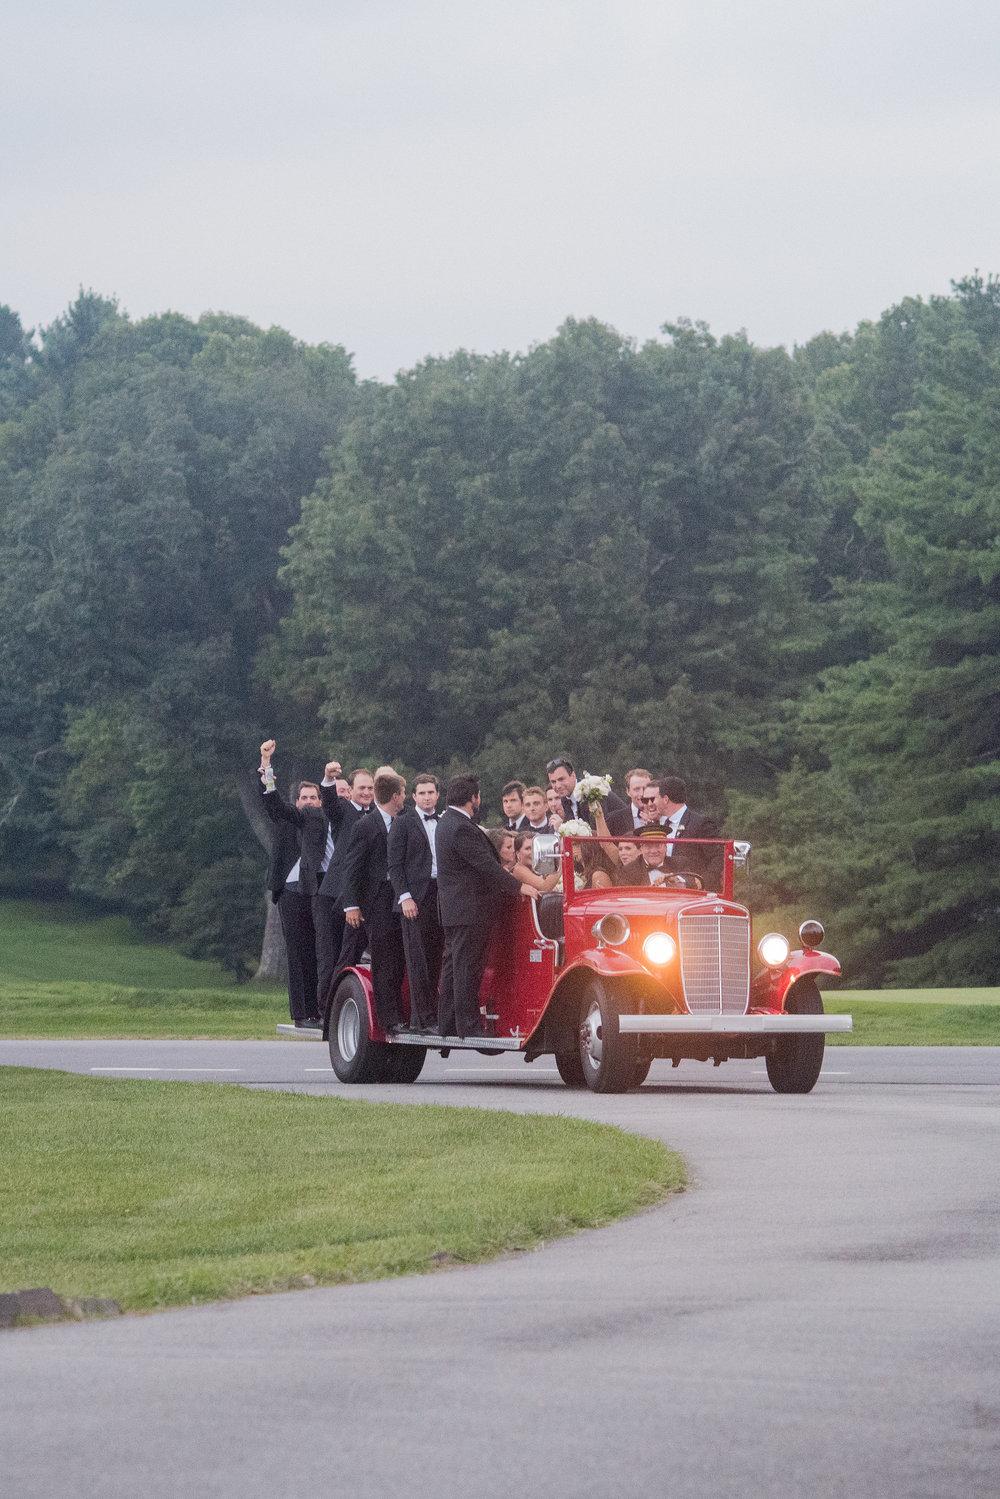 North Carolina Wedding, Events by Reagan, Destination Wedding Planner, Wedding Party